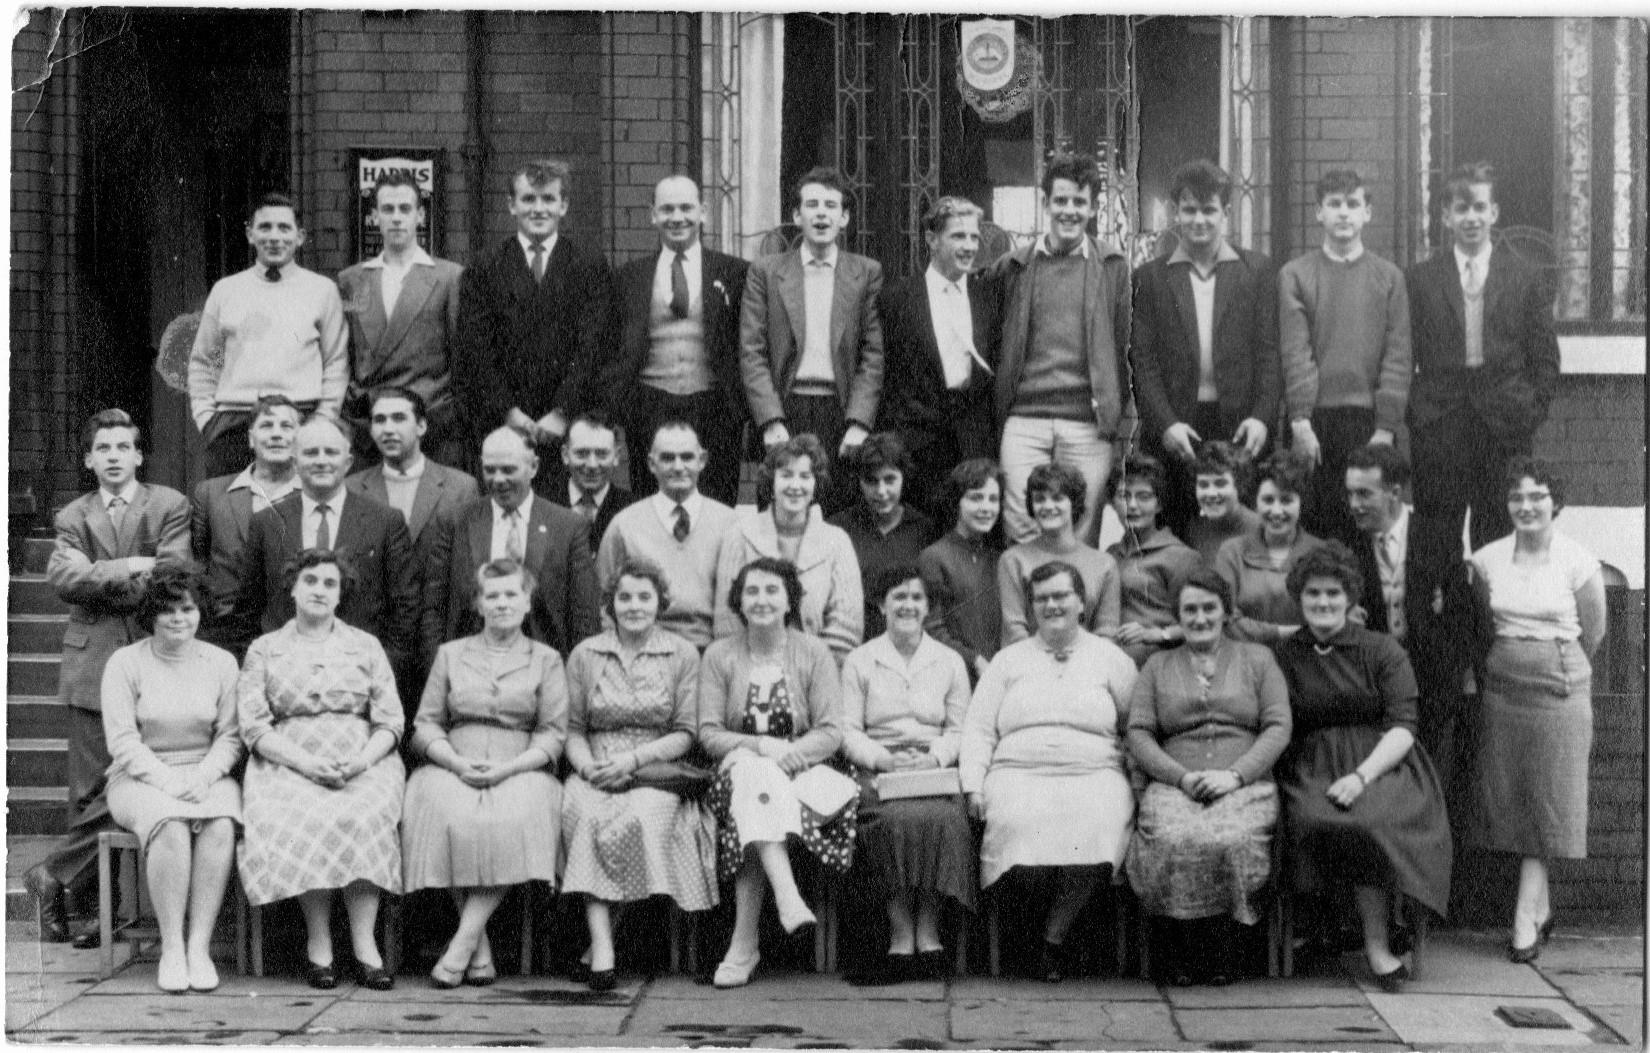 Youth Club trip to Blackpool C1954